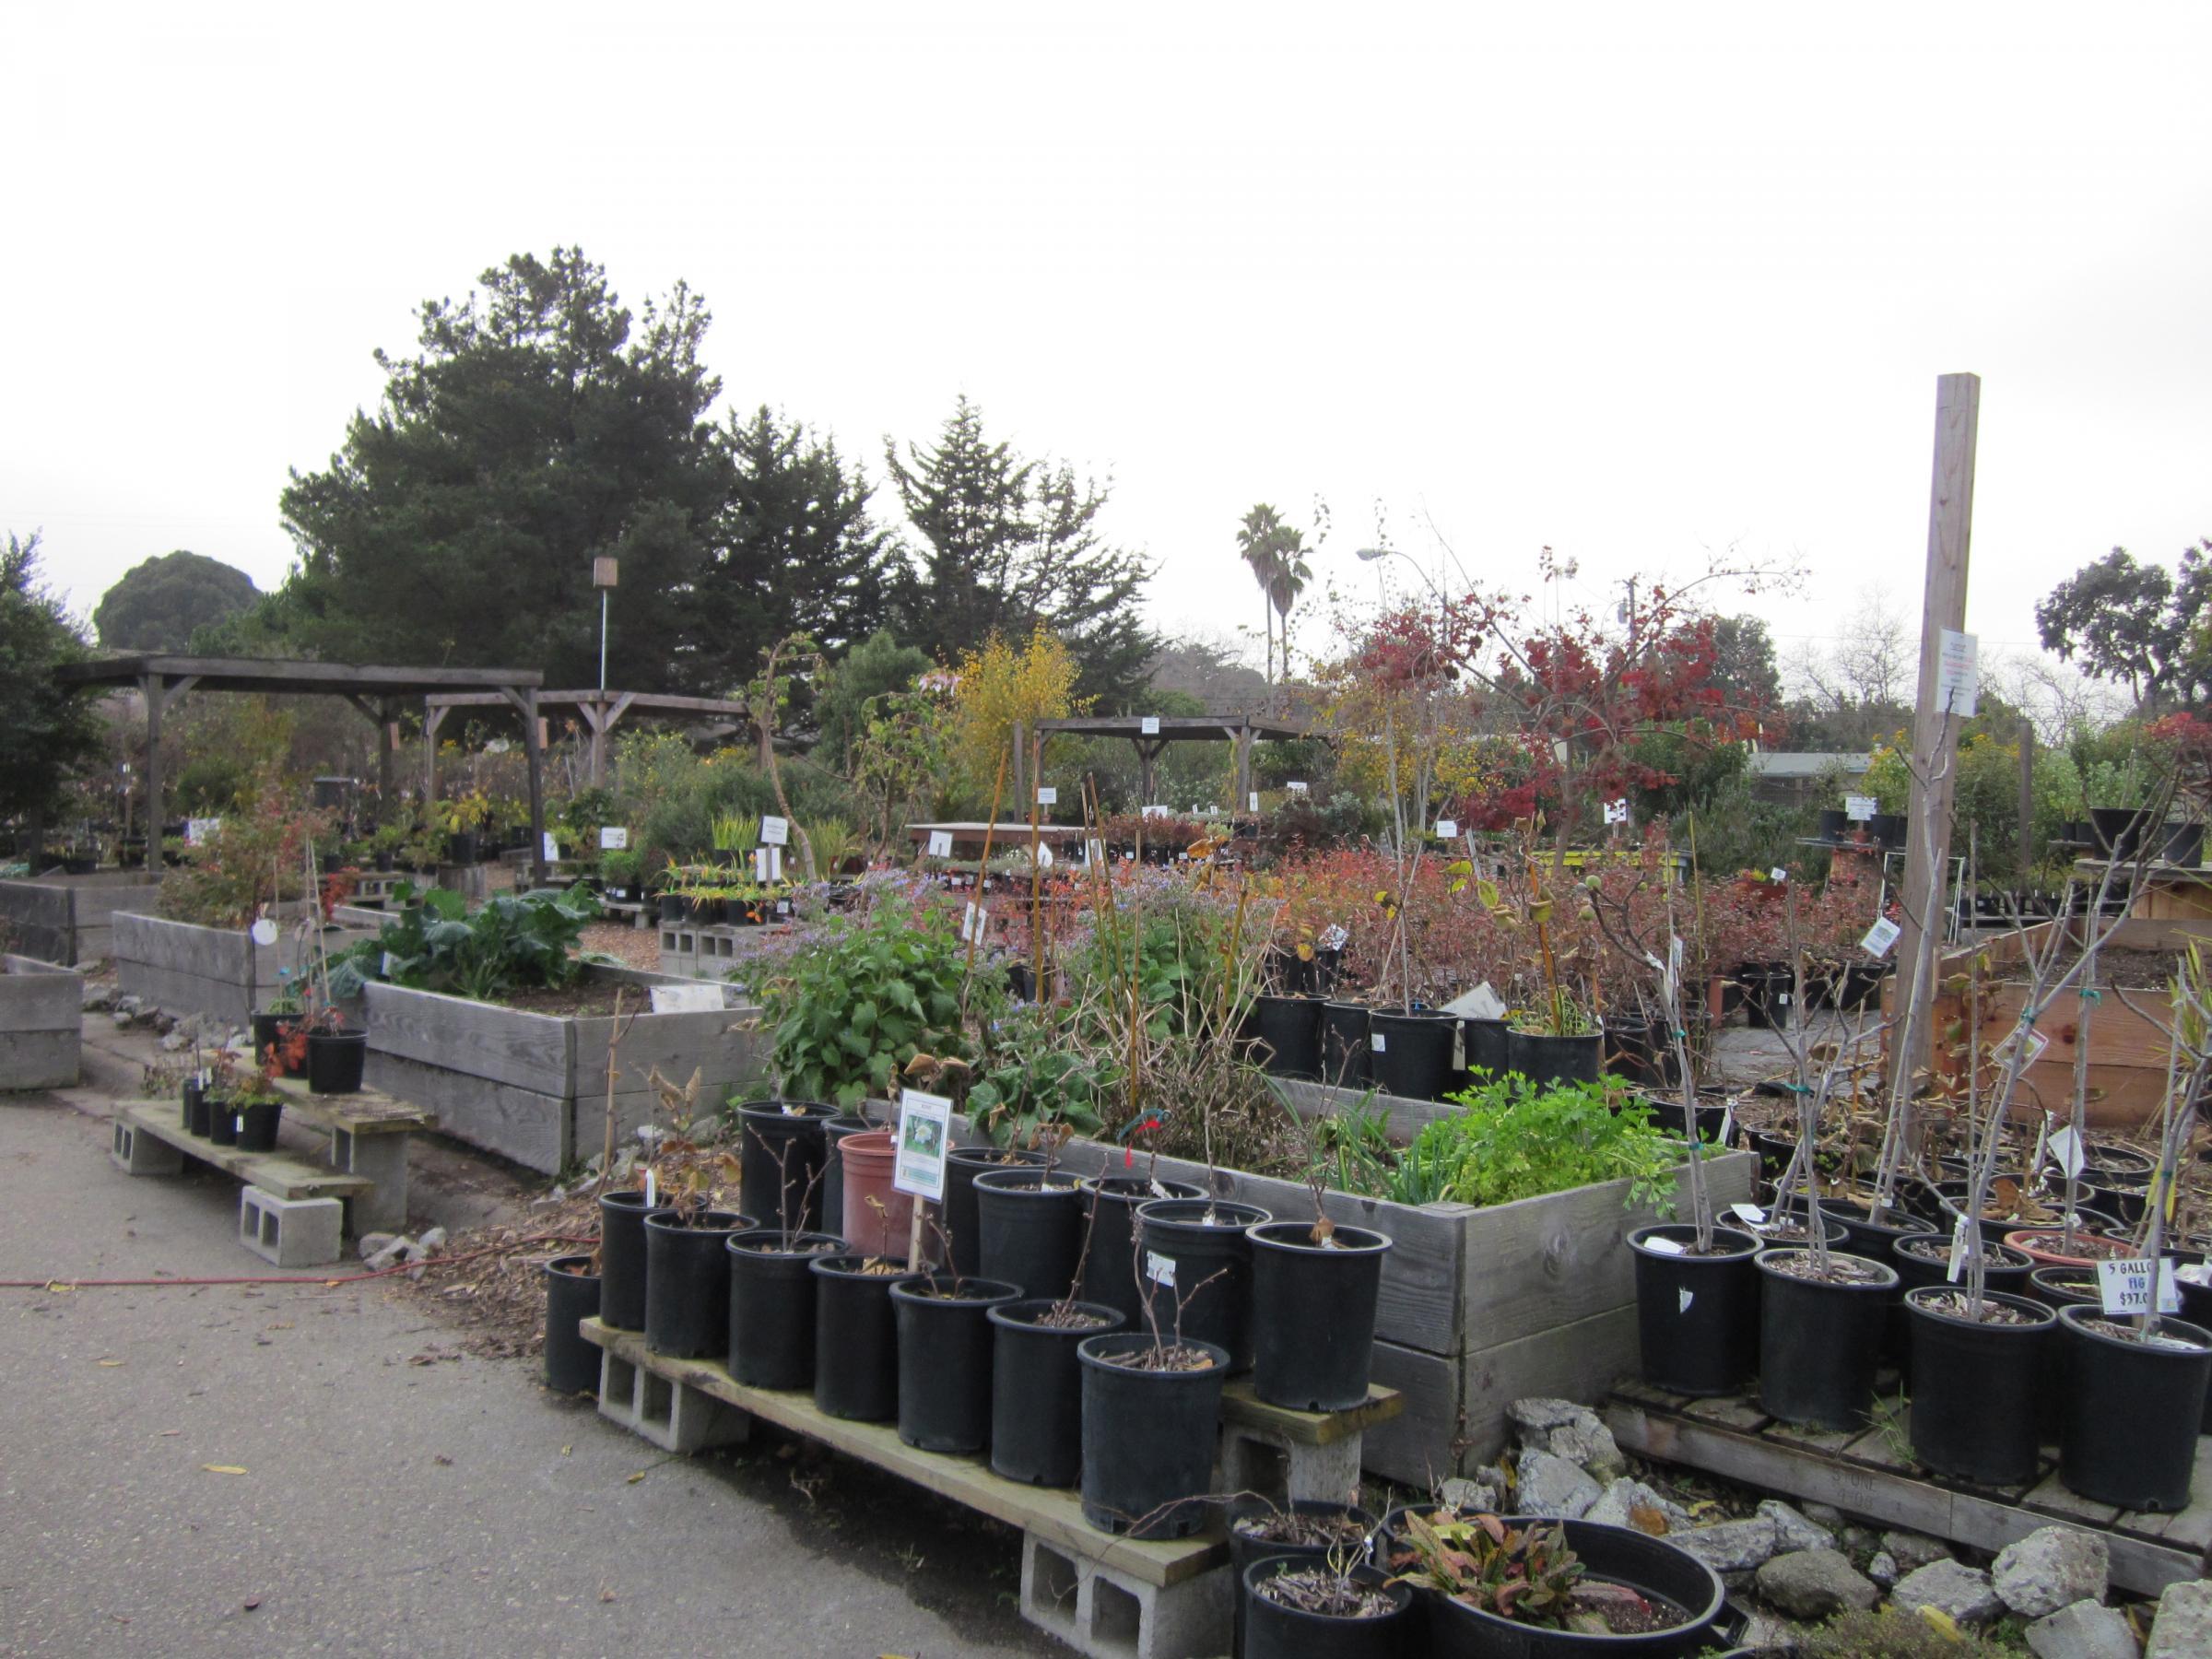 The Ploughshares Nursery During Winter Season